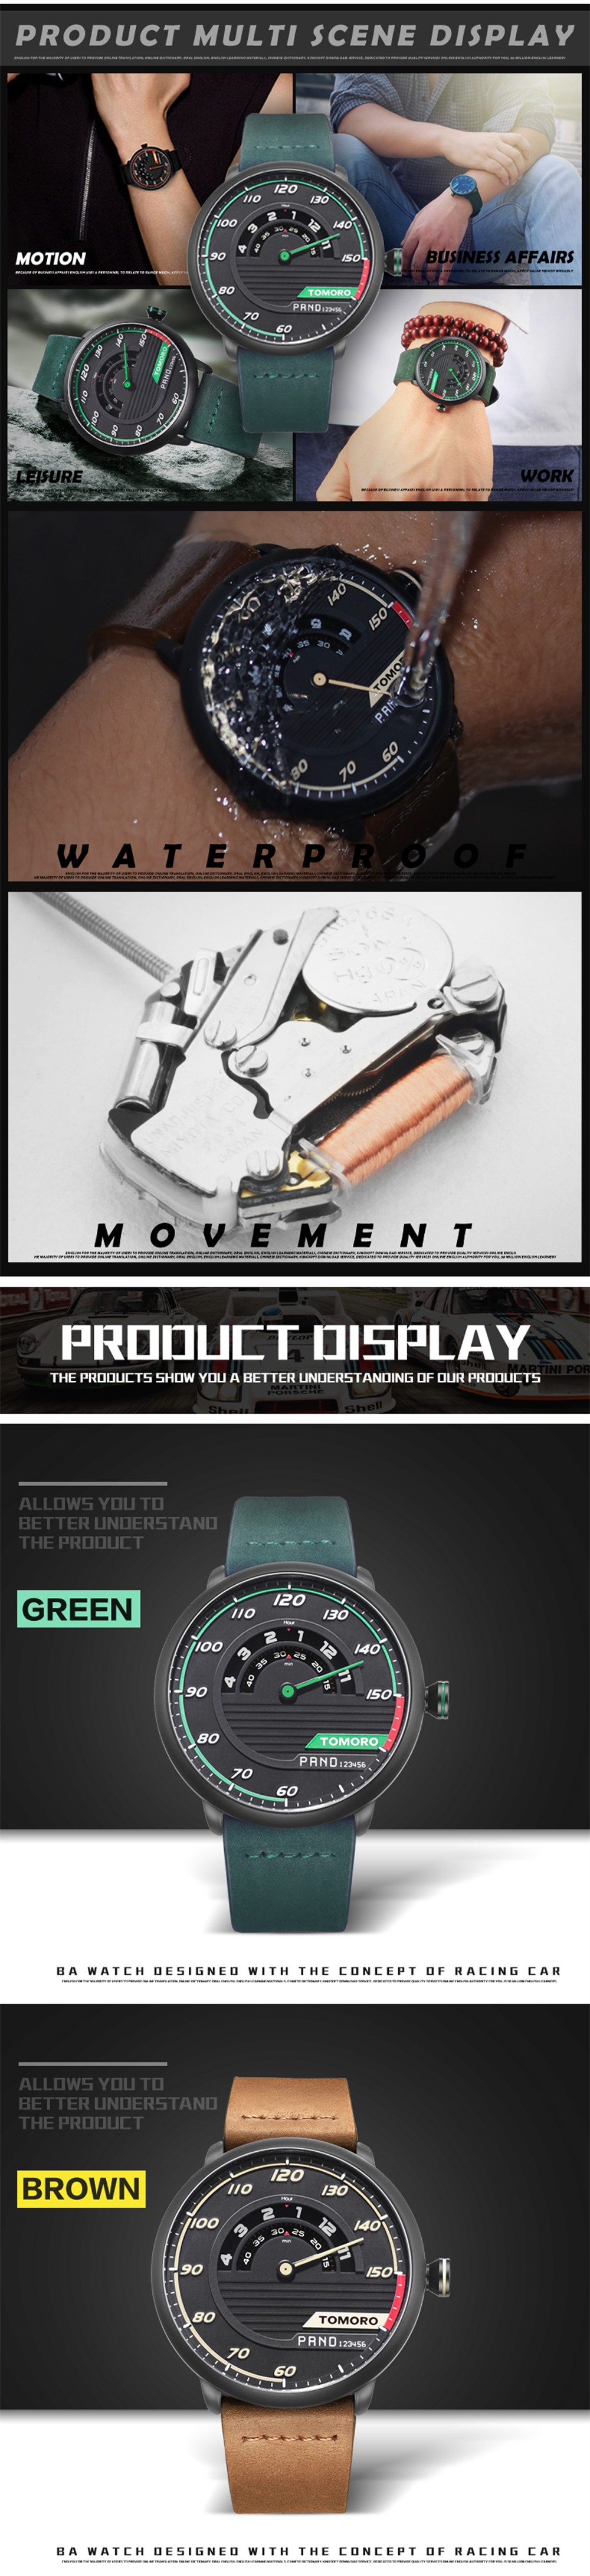 HTB1PkURQFXXXXcNaXXXq6xXFXXXg TOMORO Men's Unique Racing Car 3D Design Wrist Watch